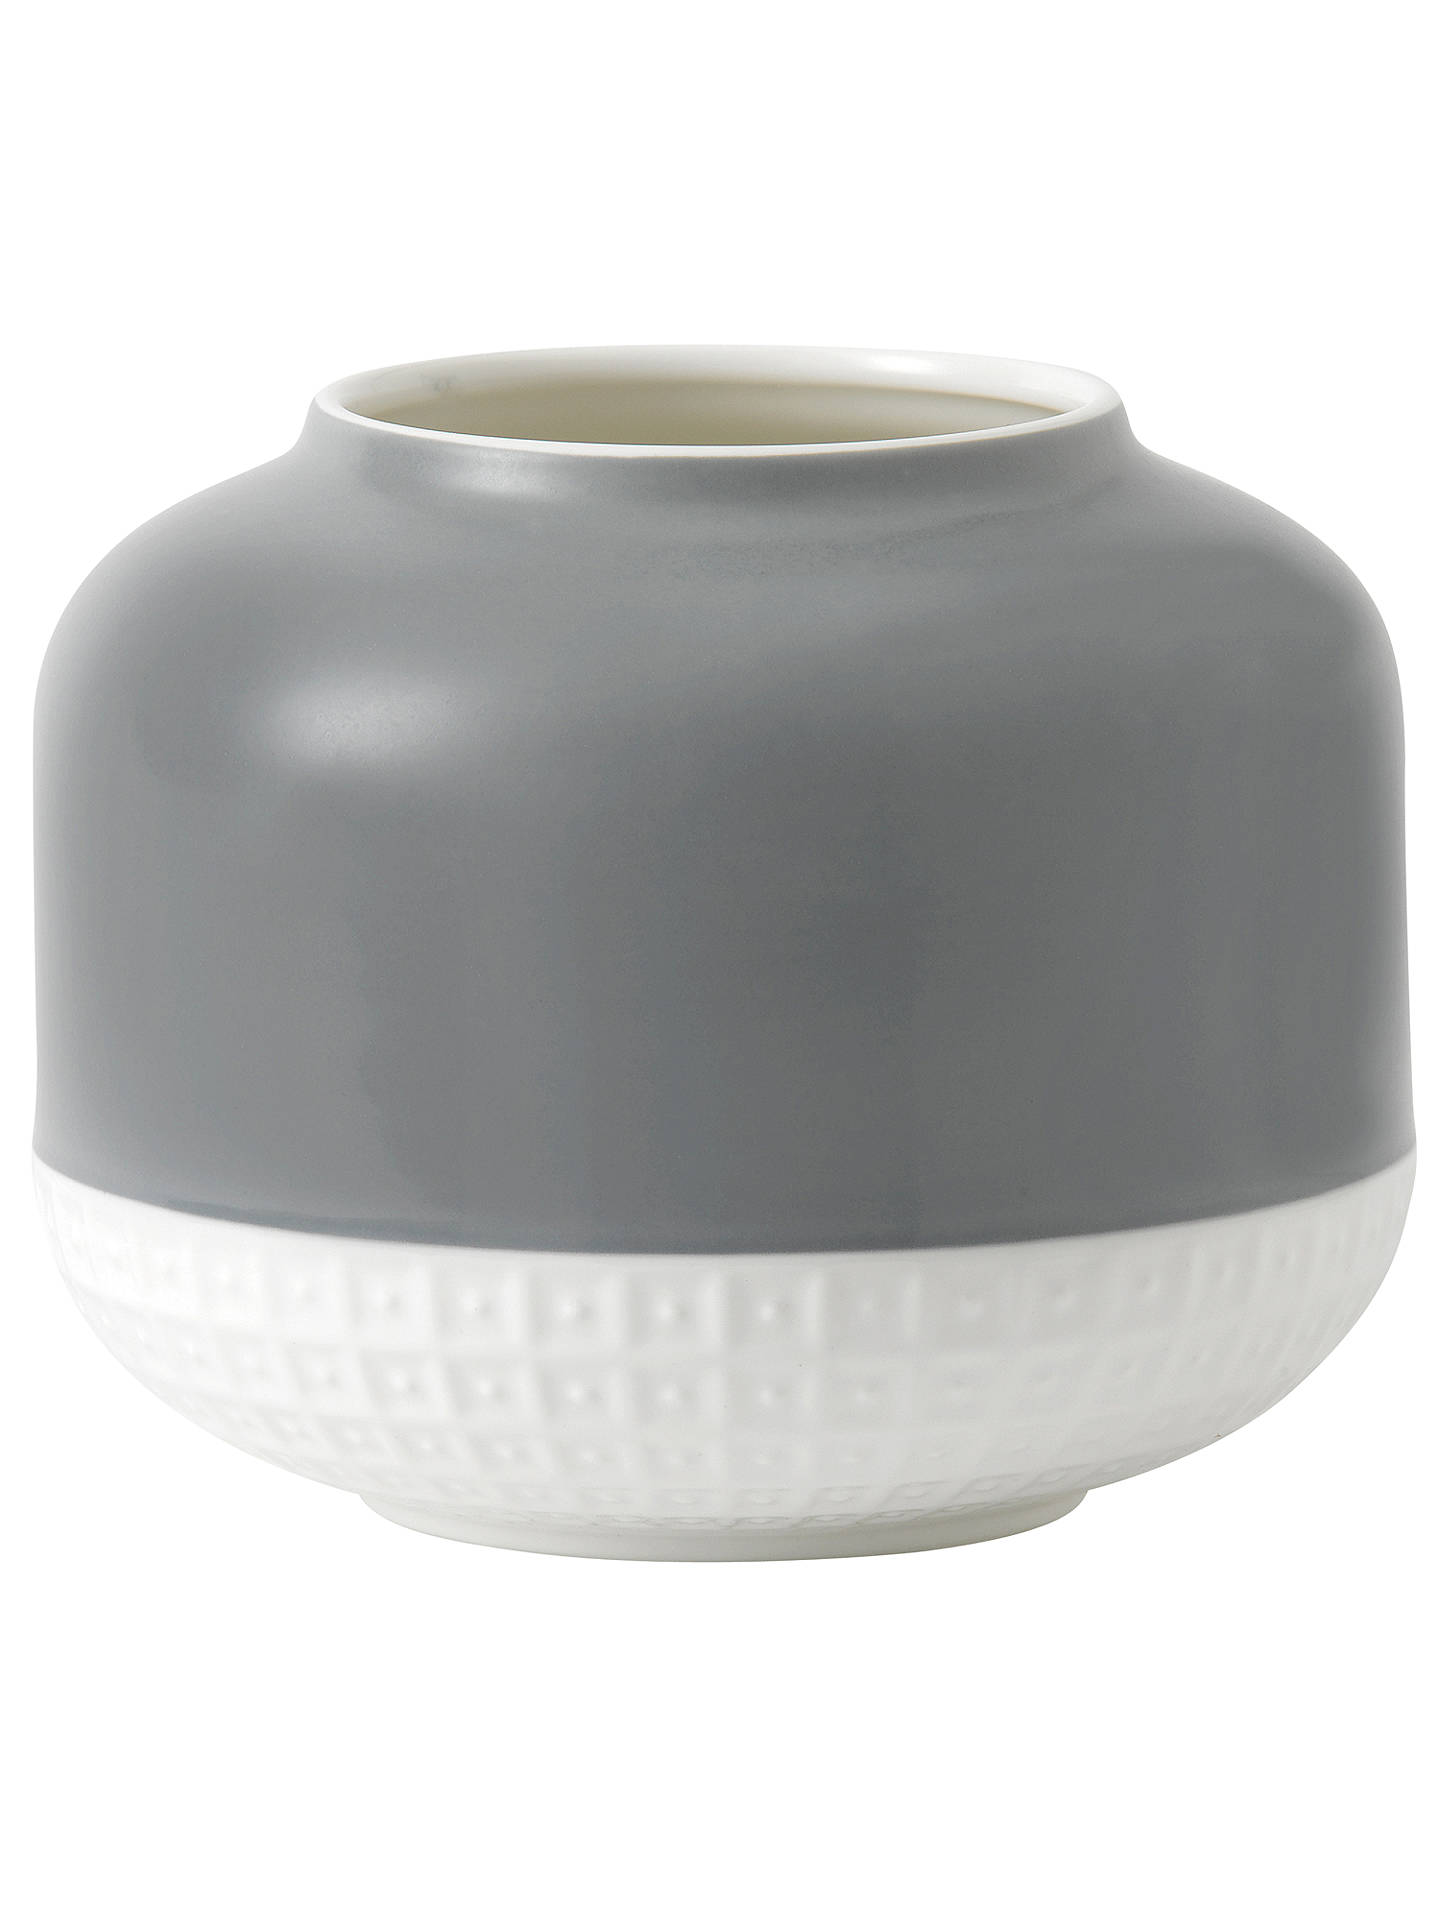 Hemingwaydesign For Royal Doulton Rose Vase H14 3cm Grey